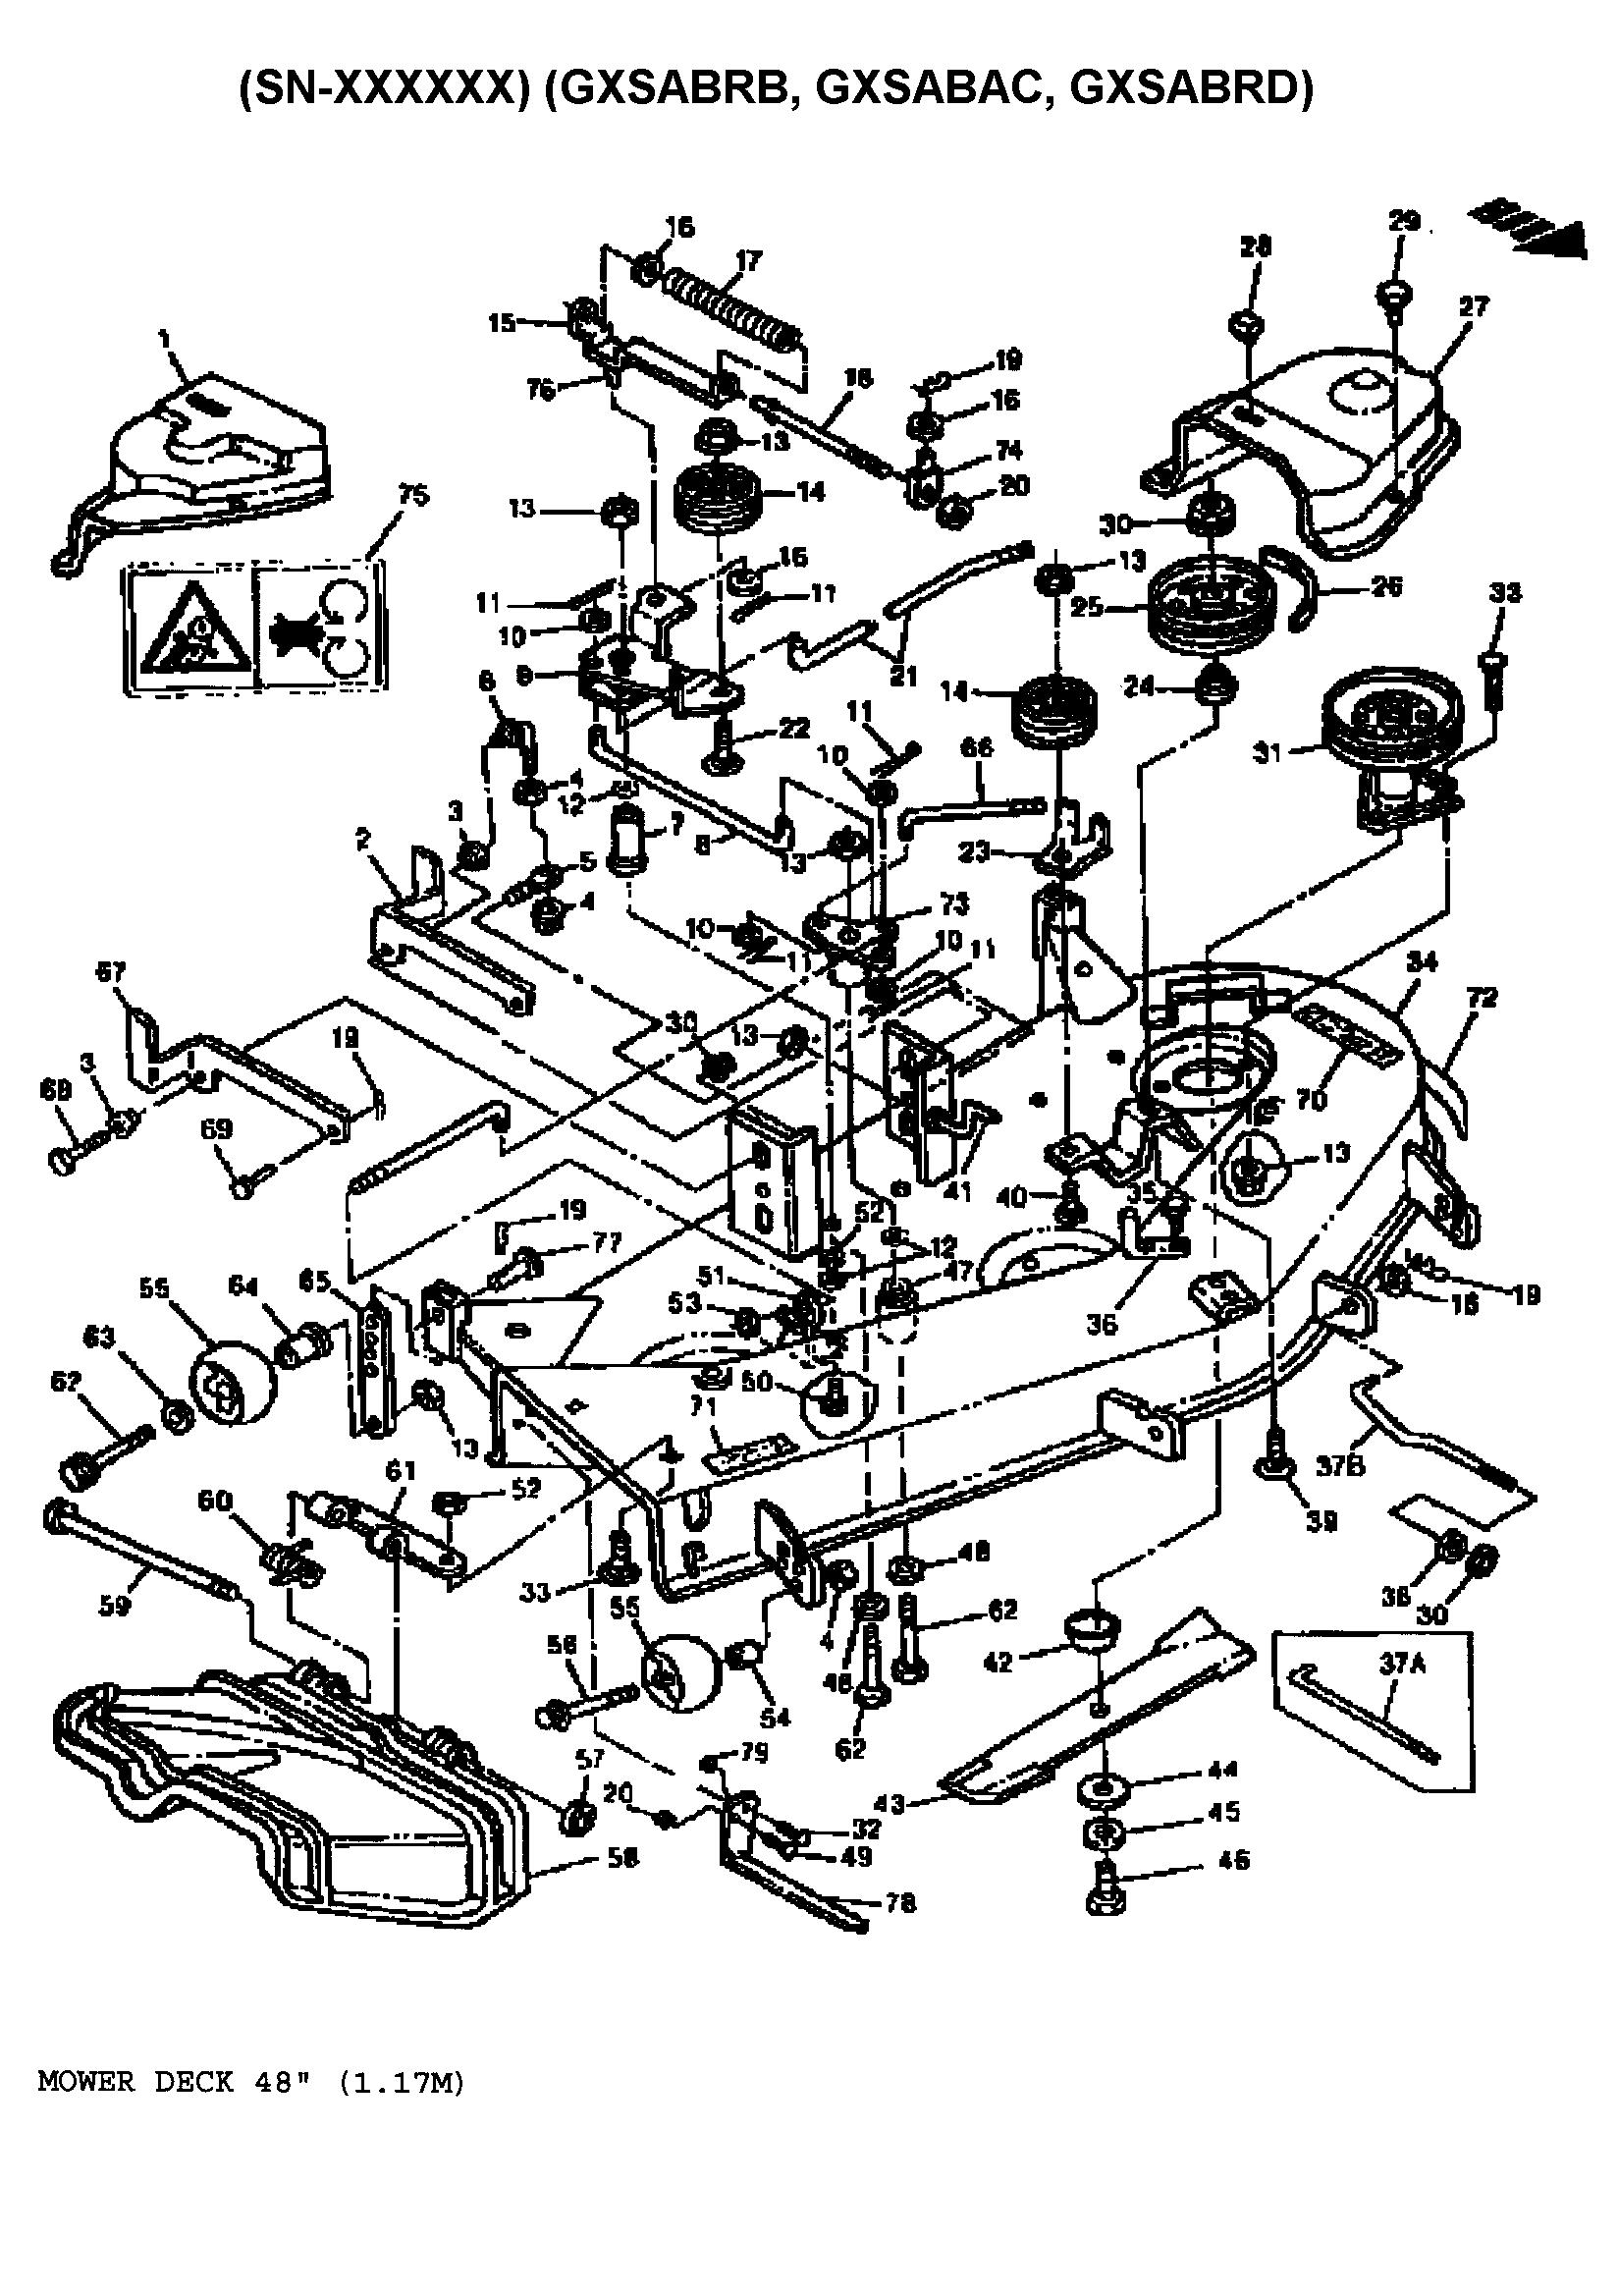 hight resolution of 400 john deere riding lawn mower wiring diagram